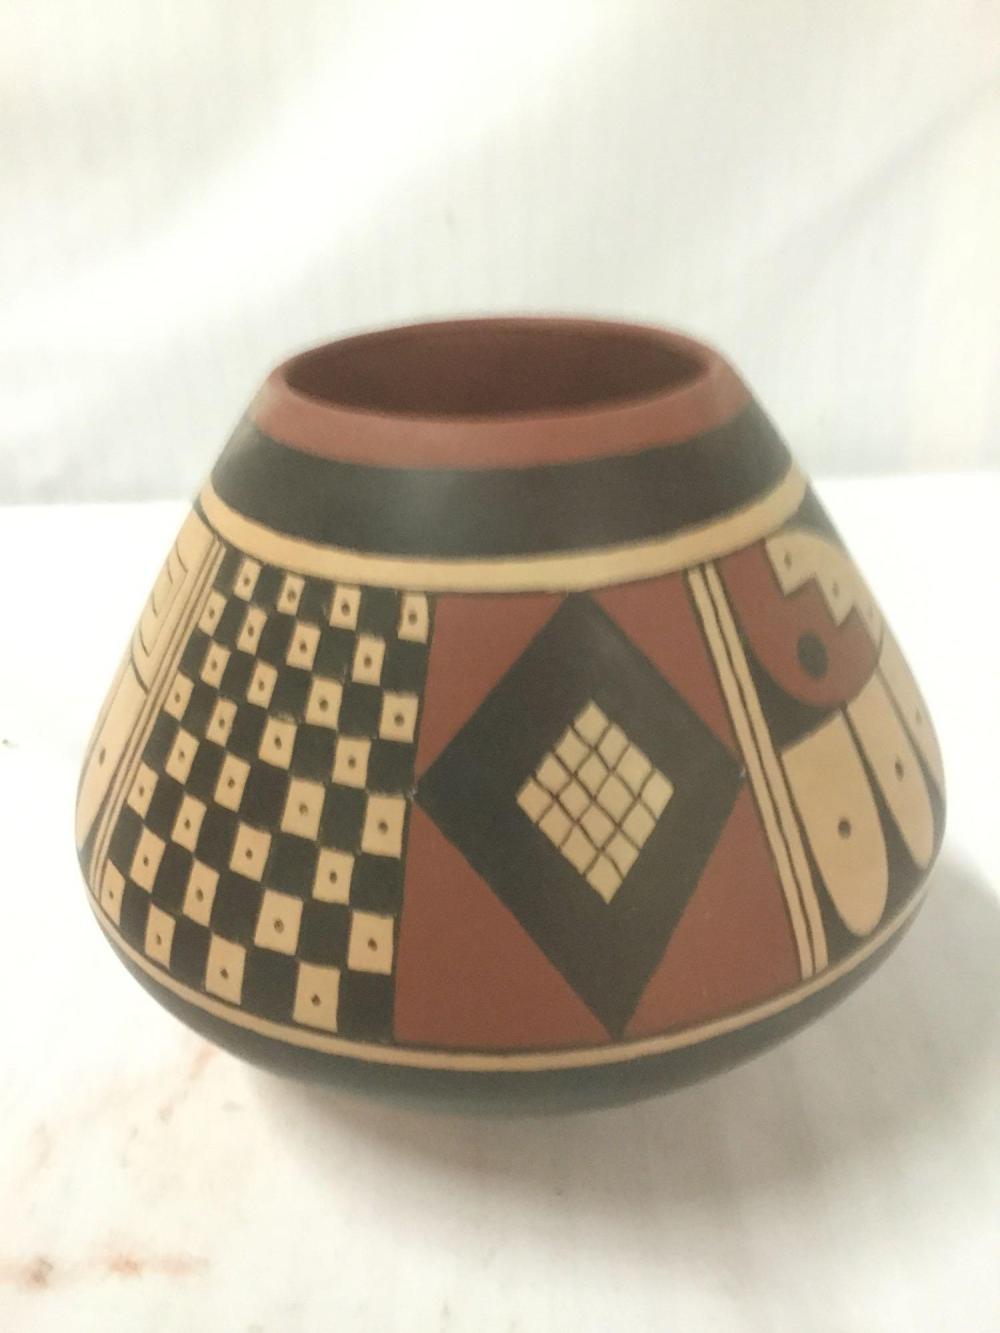 Lot 146: Genuine Hopi ceramic pots w/ COA - Bandelier Trading Co. signed A. Yesselith Hopi & S. Setall